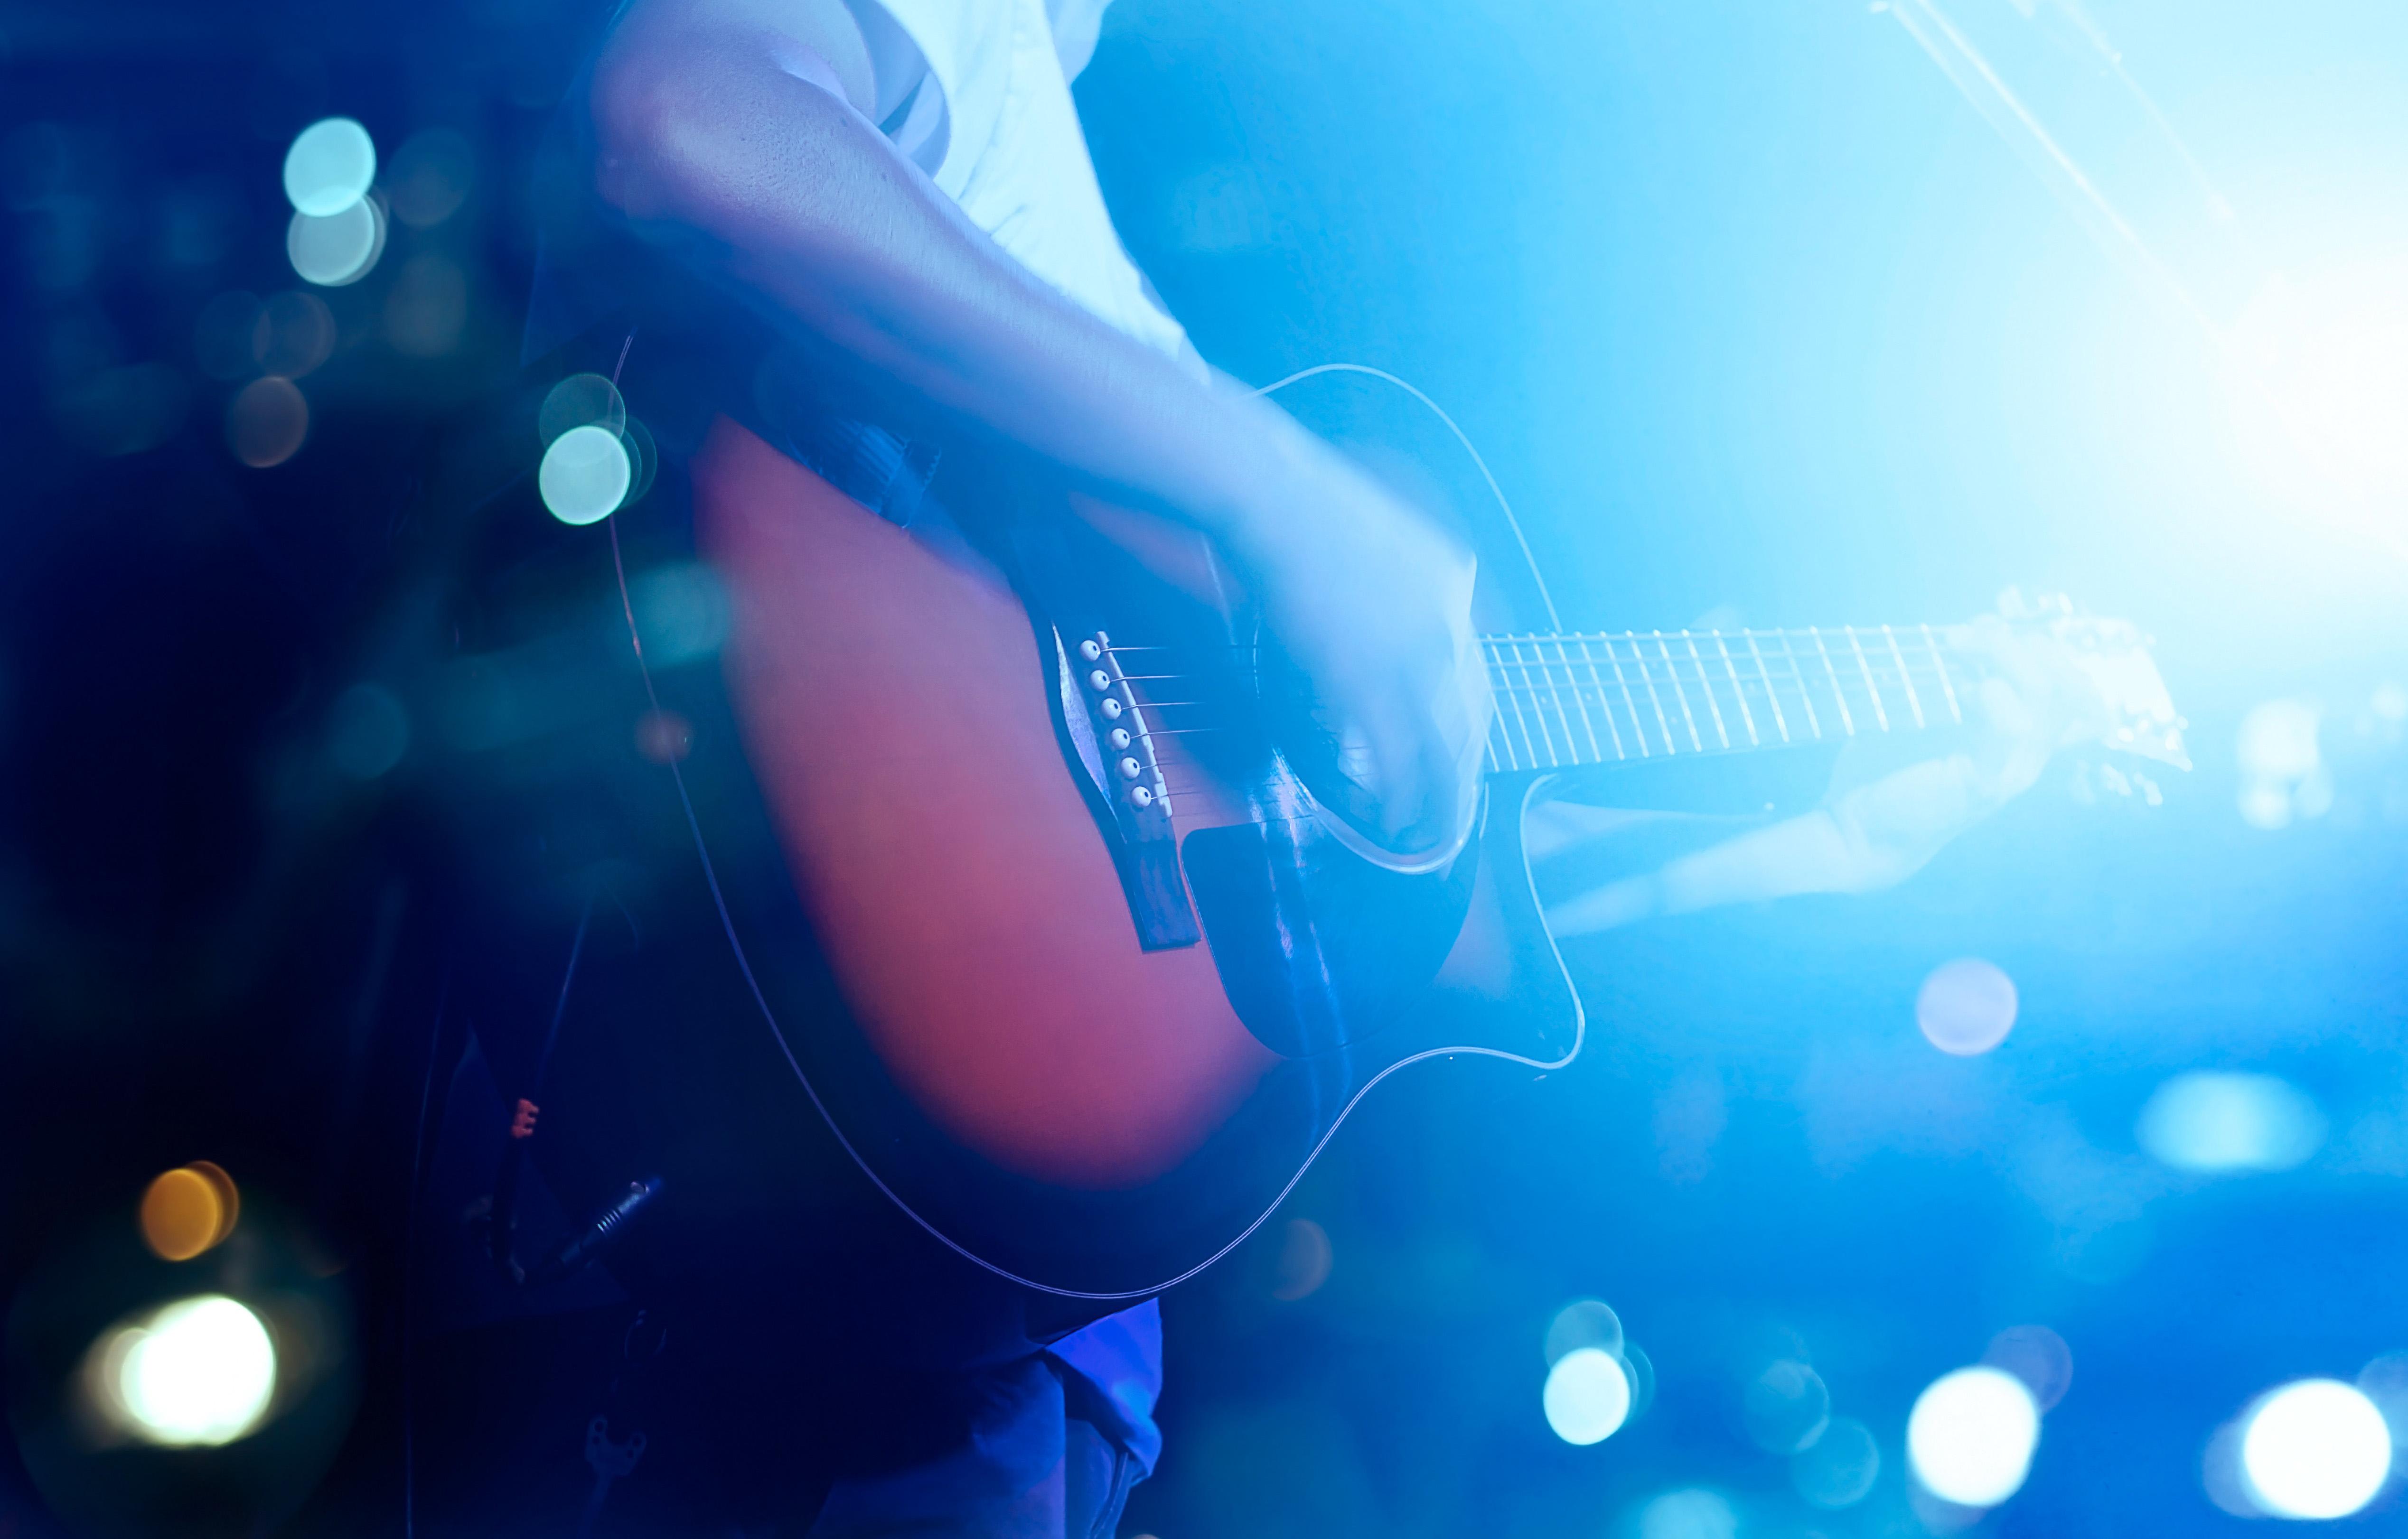 live-optredens-corona-grolsch